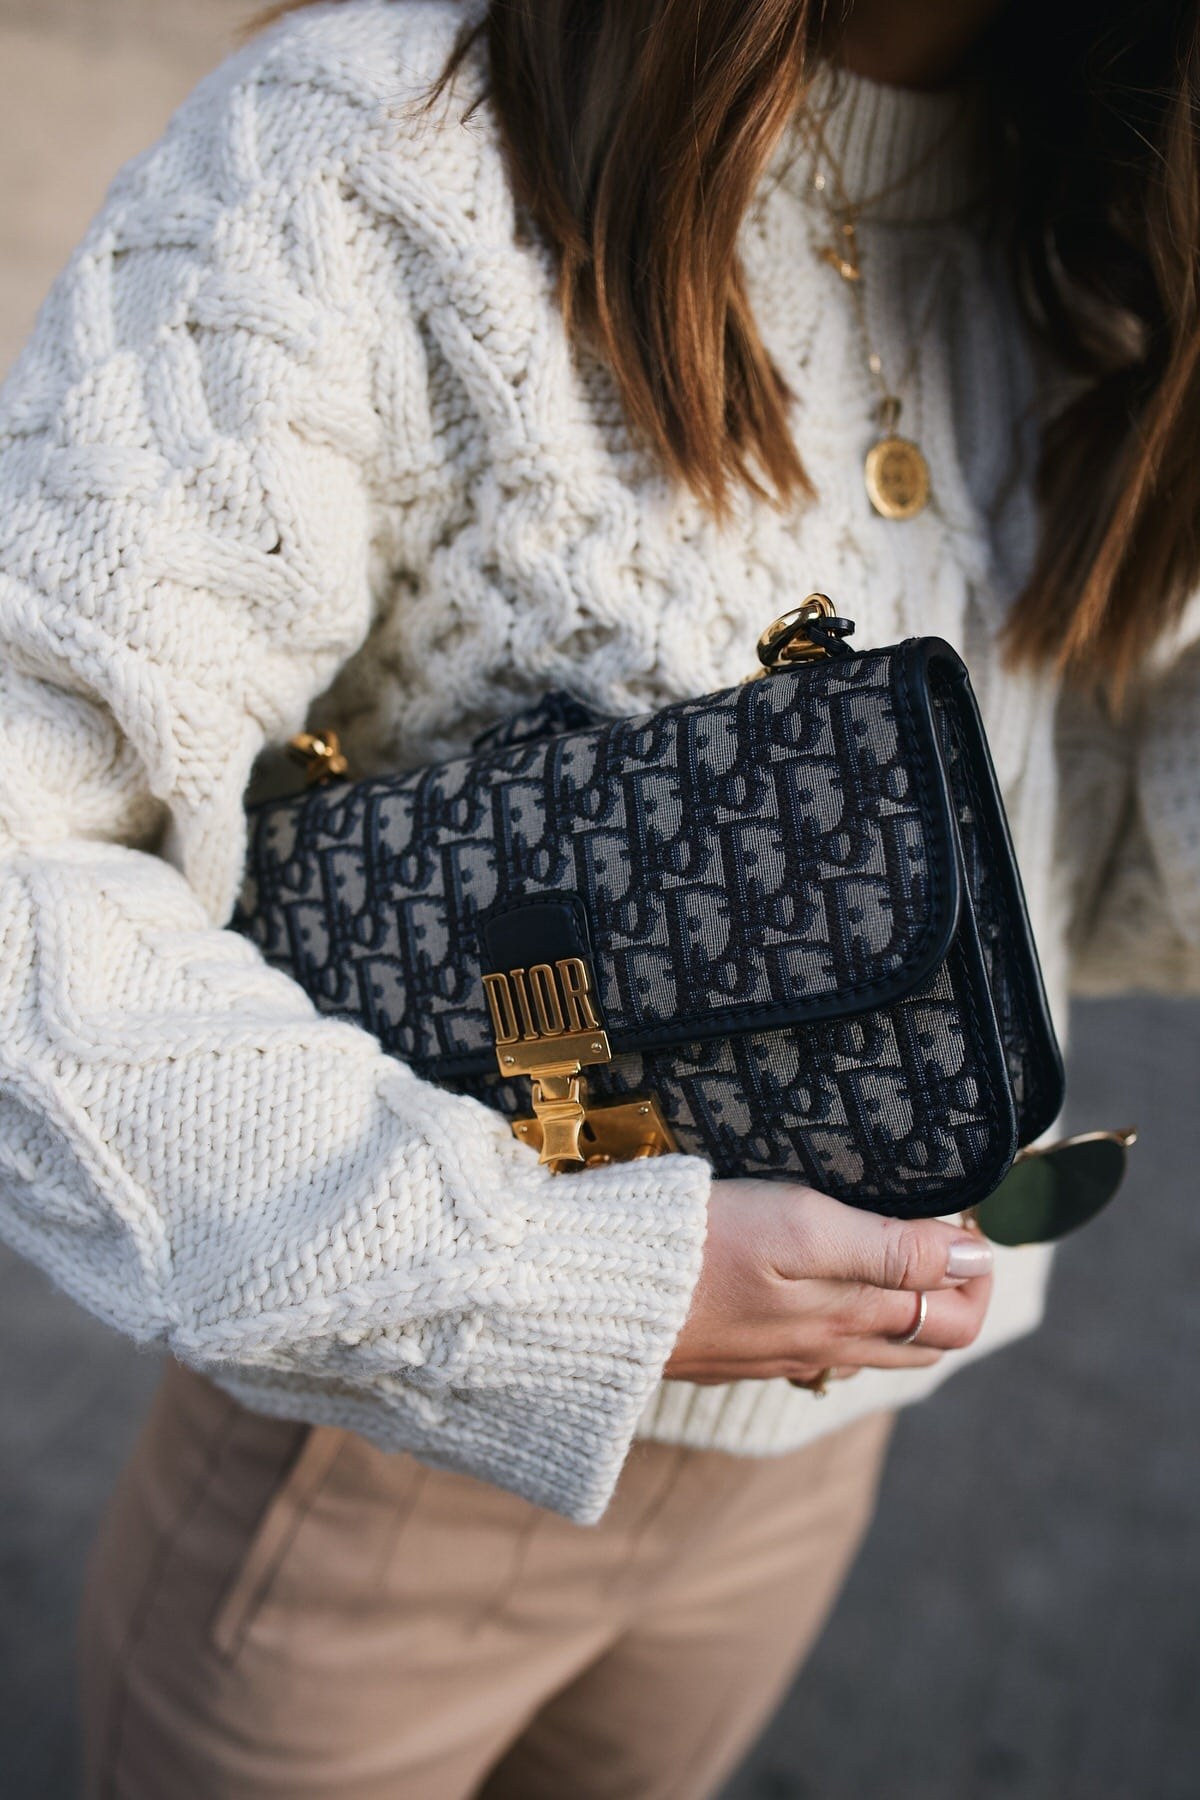 Boots, Herbst Winter 2019, Trend, Chelsea Boots, Combat Boots, Zara, Bottega Veneta, Dior Oblique, Chanel